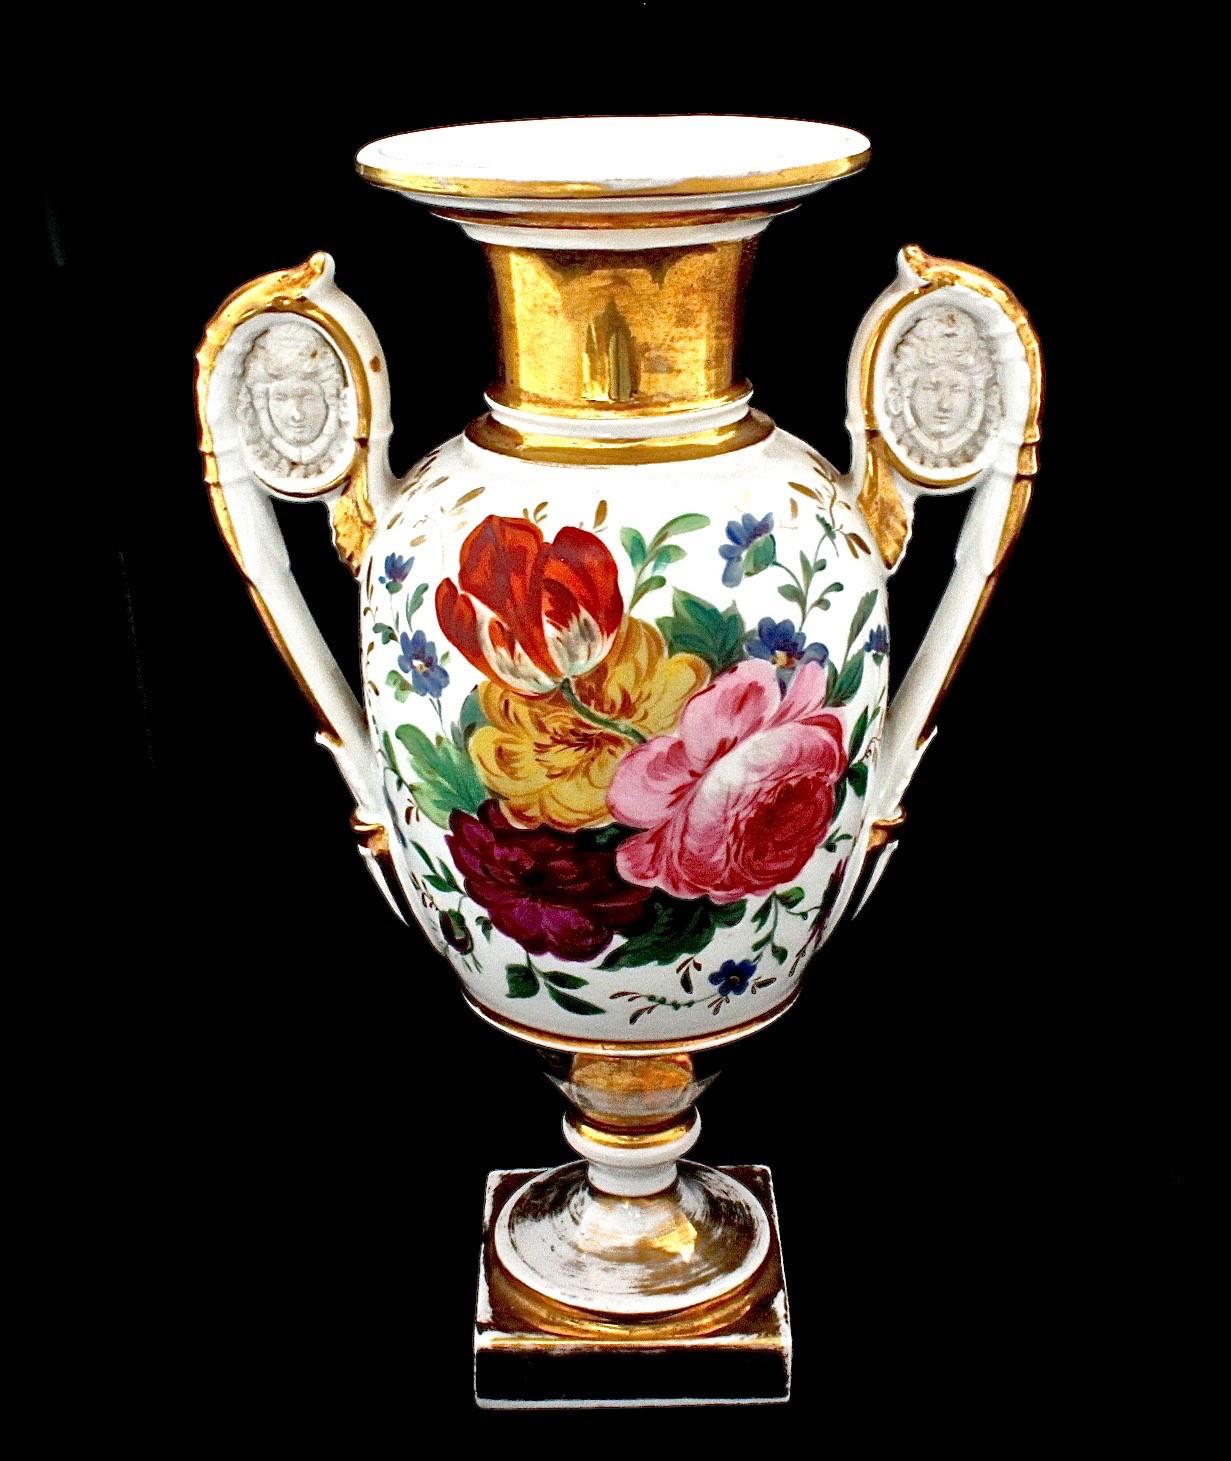 Антикварная ваза для цветов. Франция 19 век.